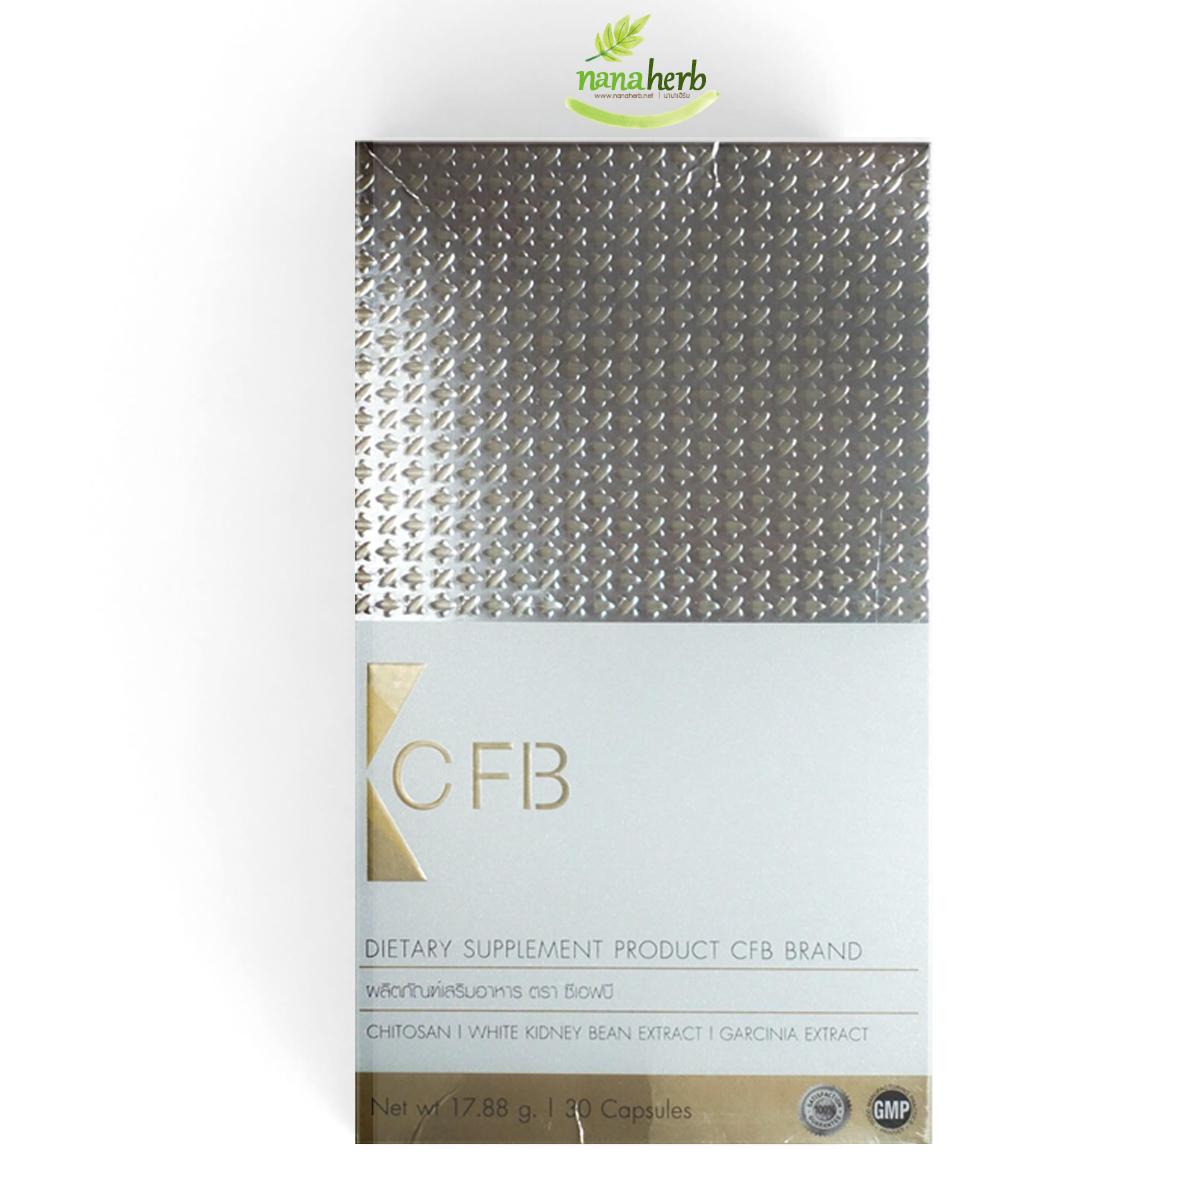 CFB (ซีเอฟบี) อาหารเสริมลดน้ำหนัก ดักจับไขมันและแป้ง